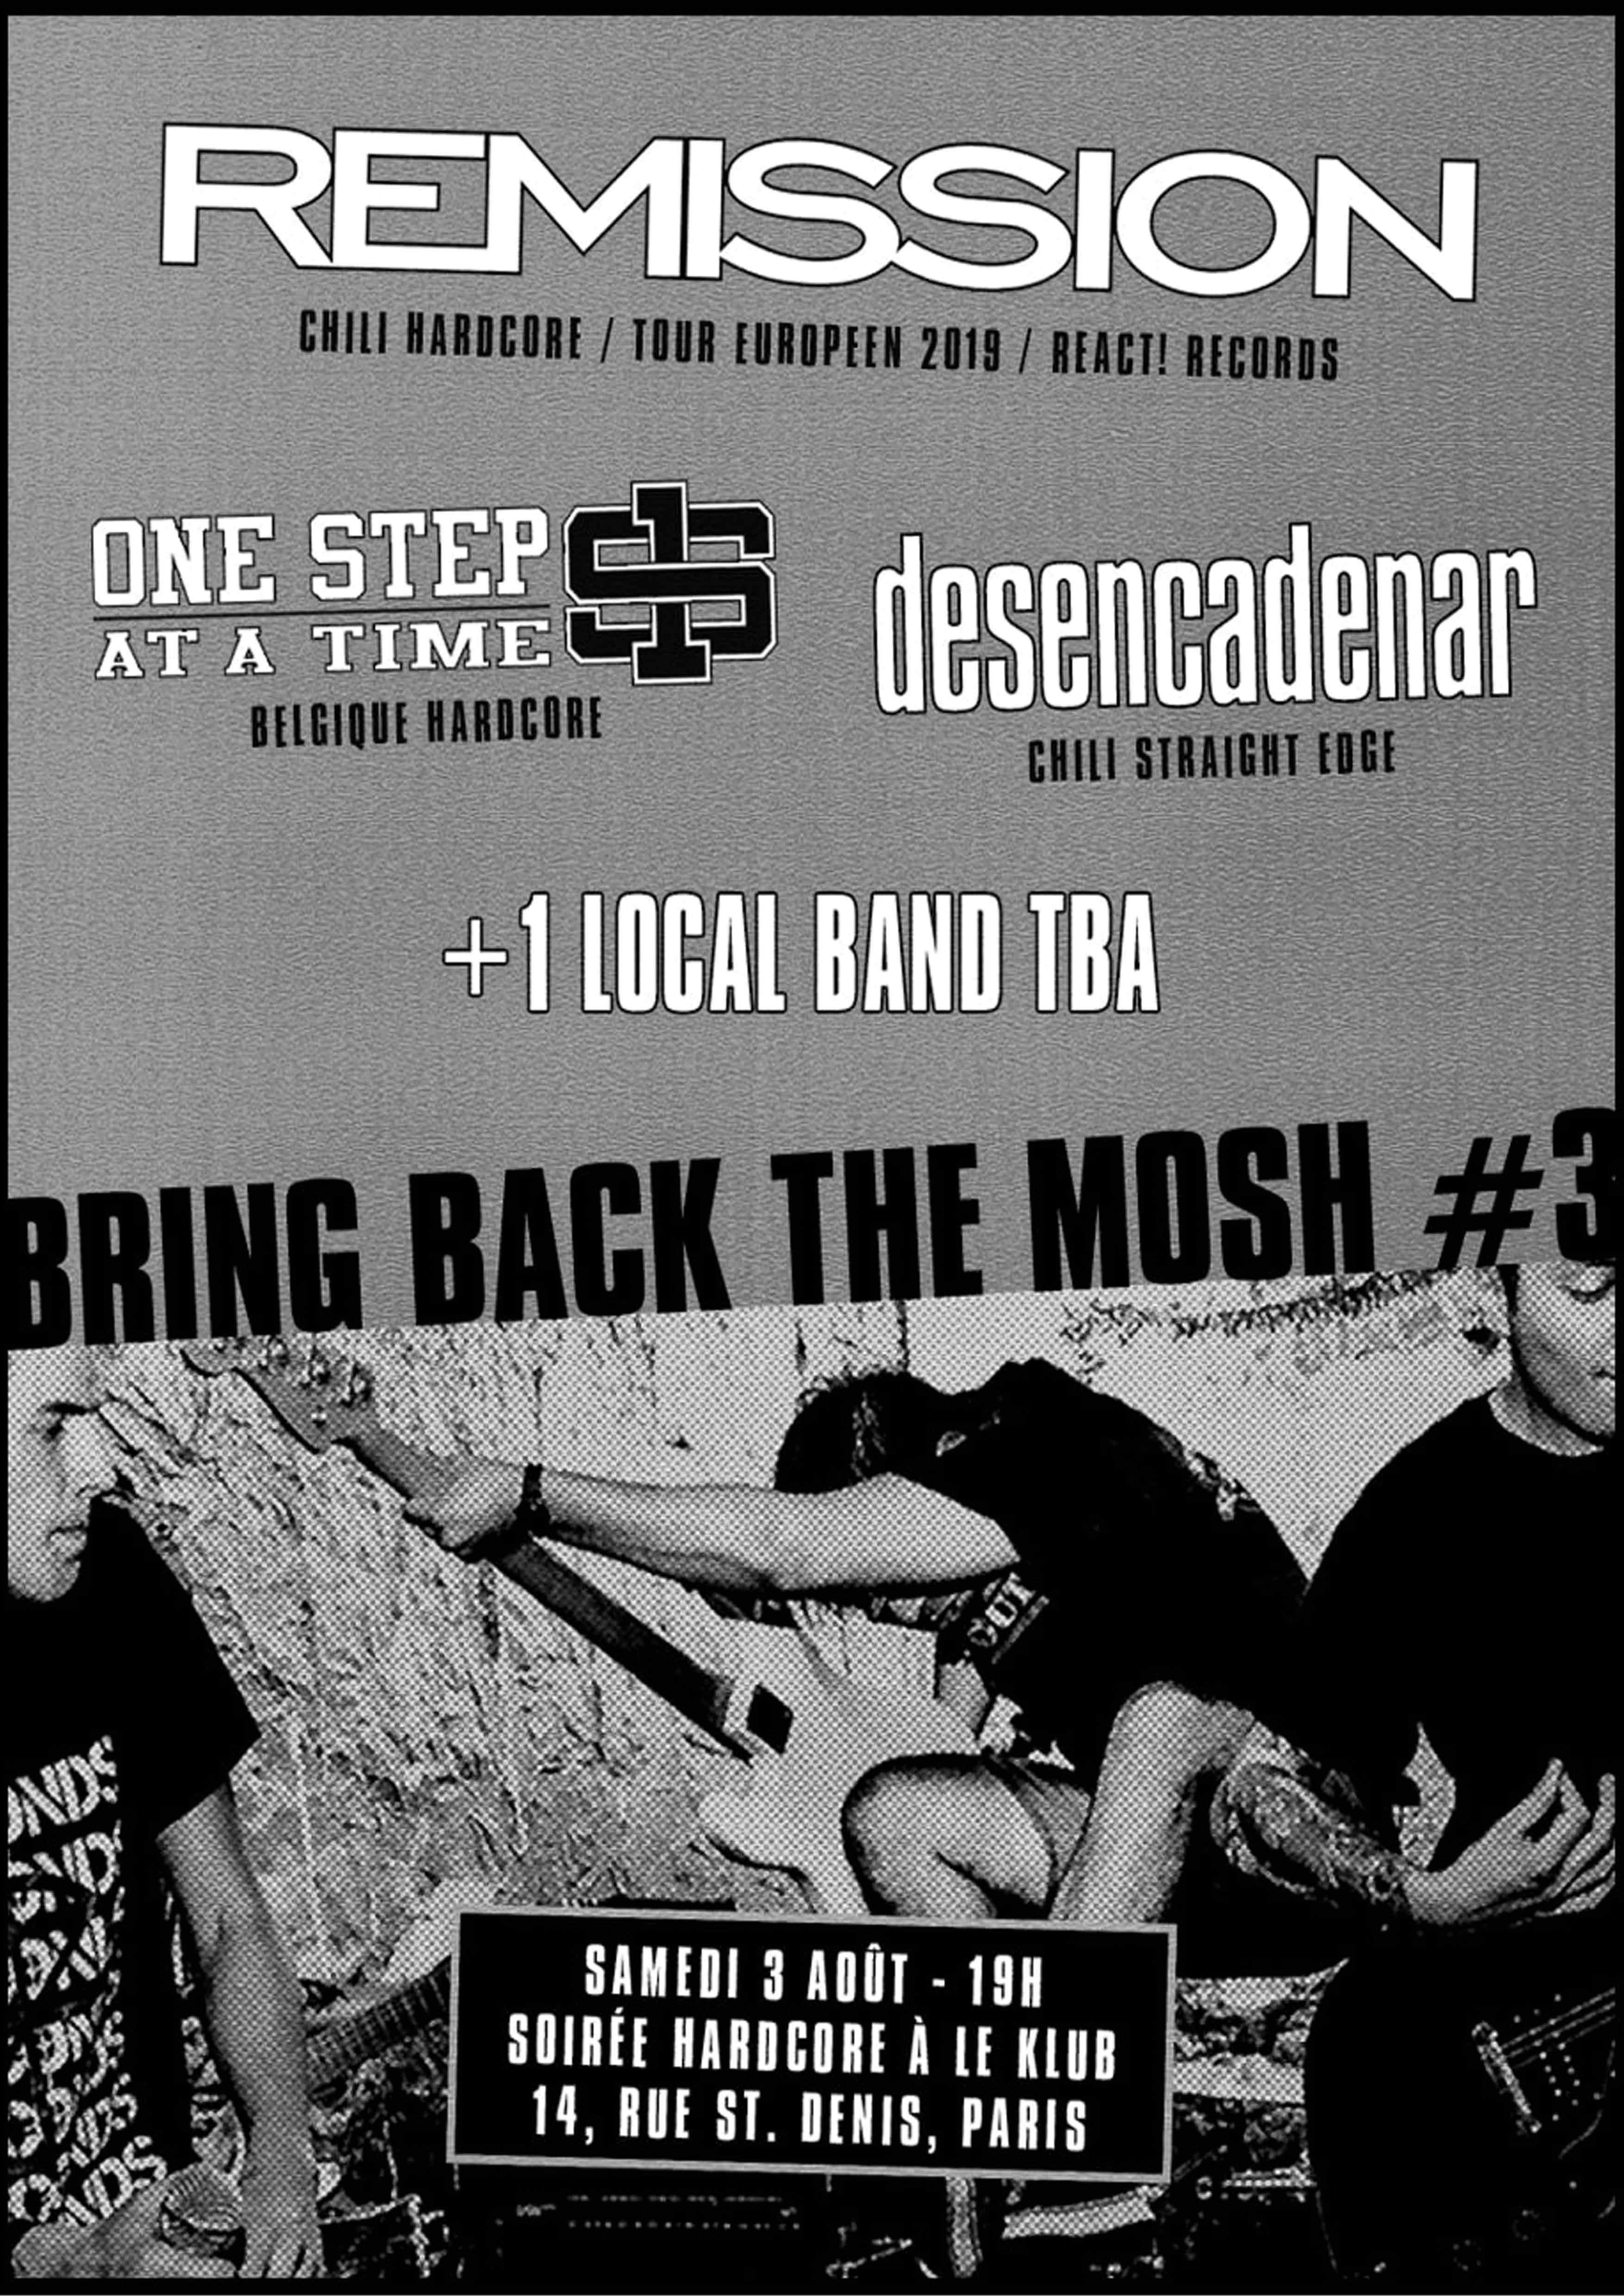 Bring Back The Mosh // 03.08